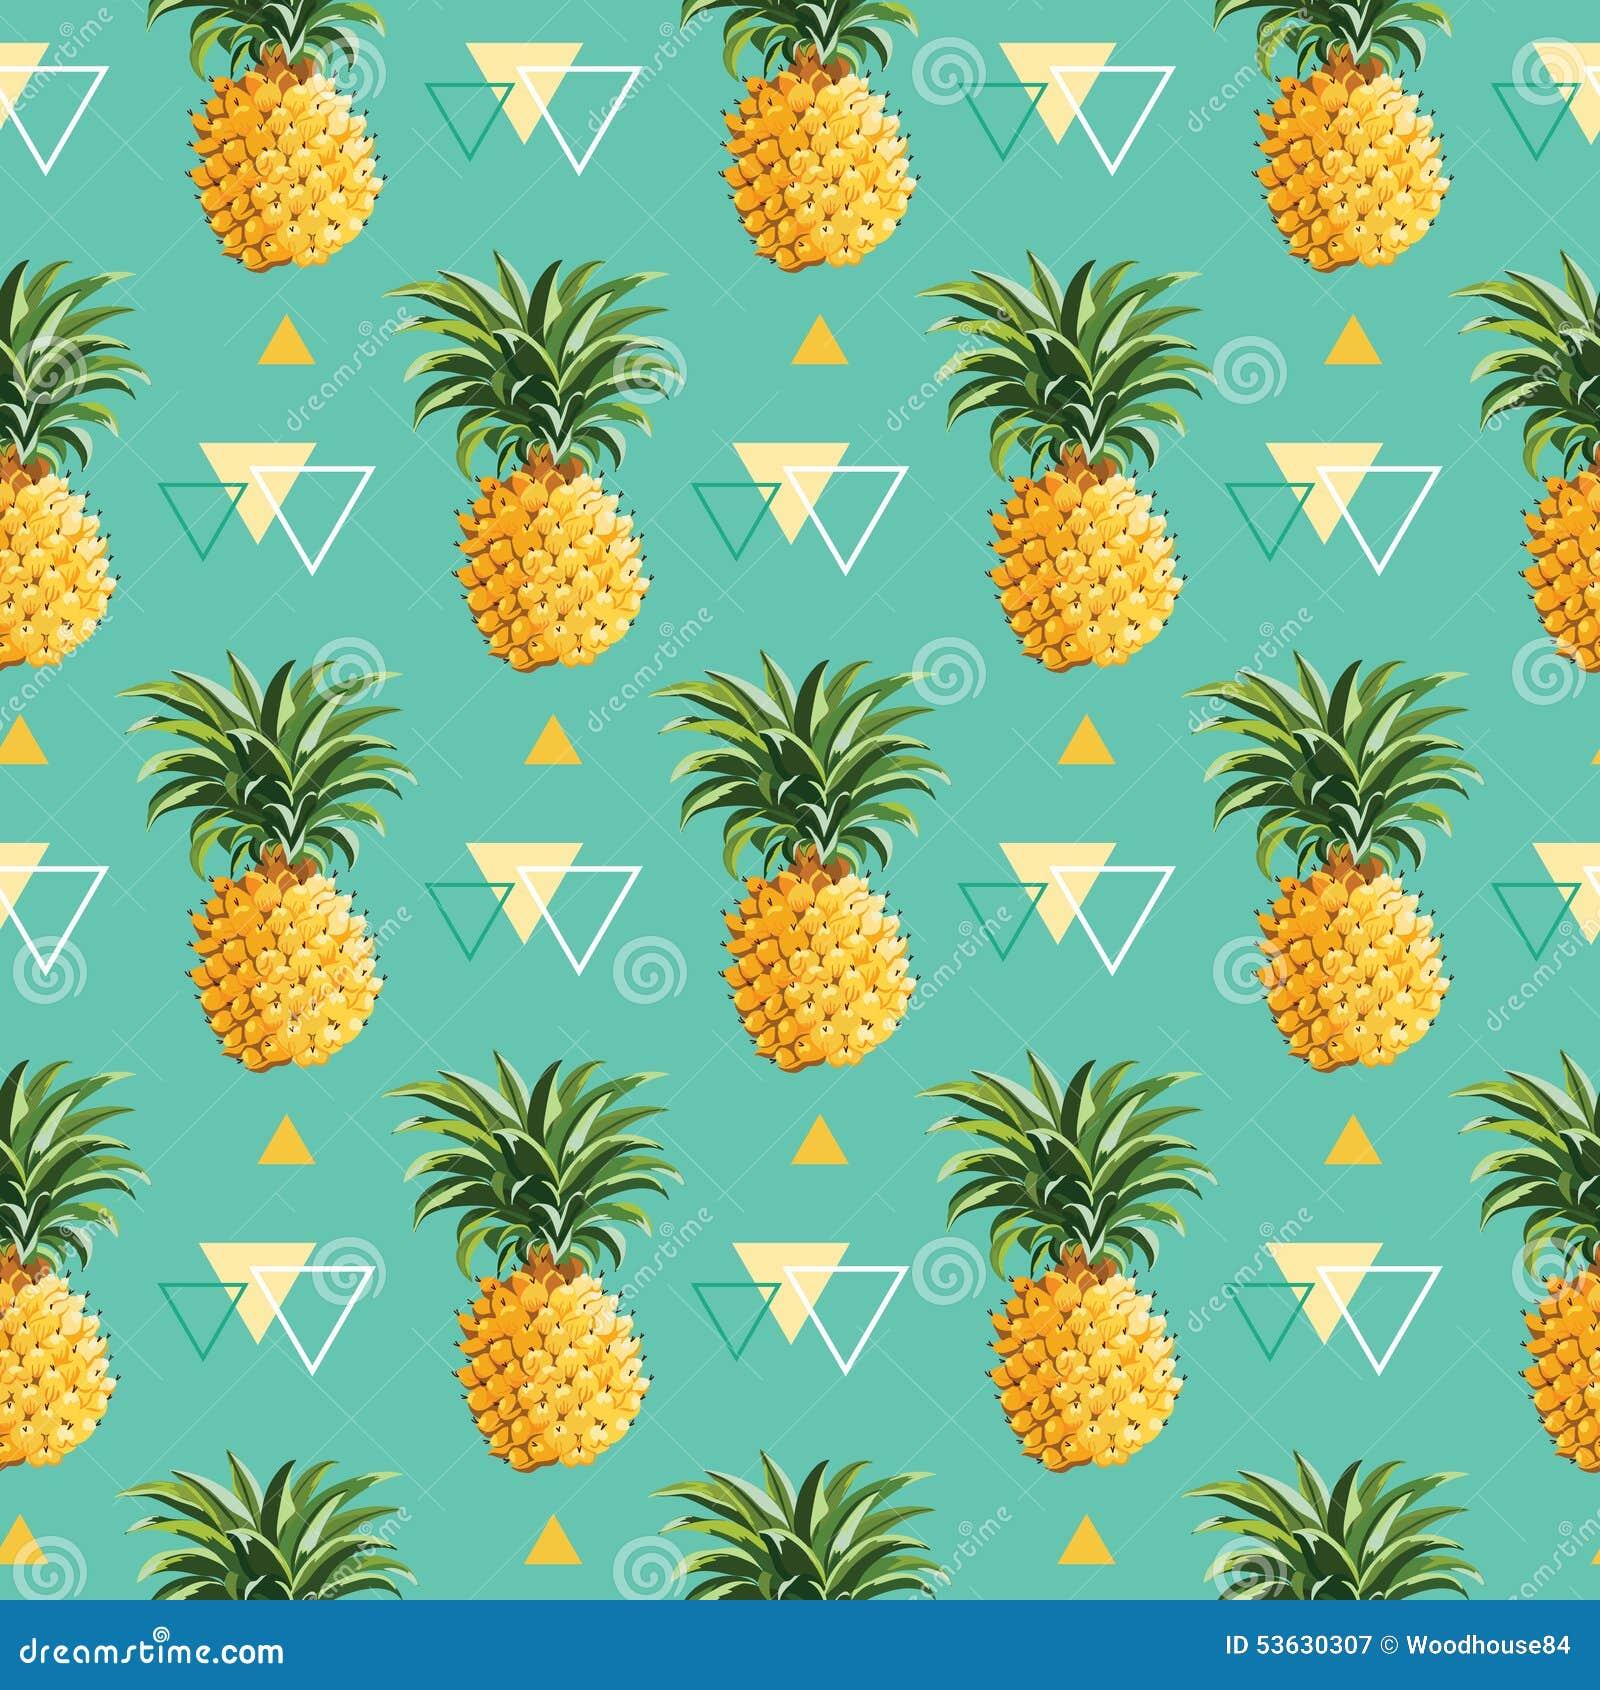 Geometric Pineapple Background Stock Vector - Image: 53630307